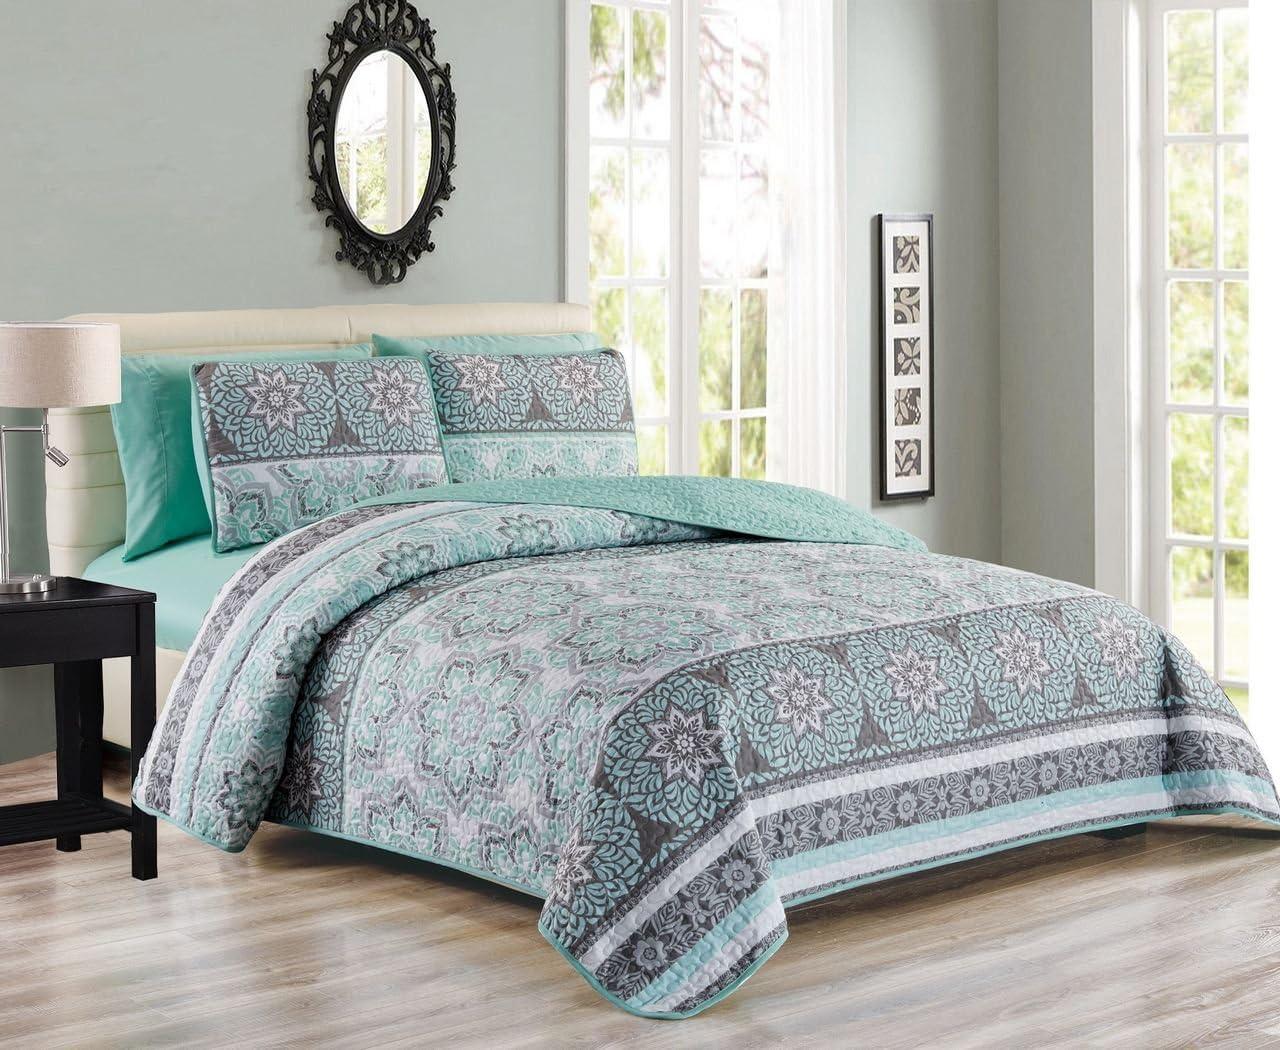 6 Piece Medallion Floral Patchwork Reversible Bedspread//Quilt with Sheet Set